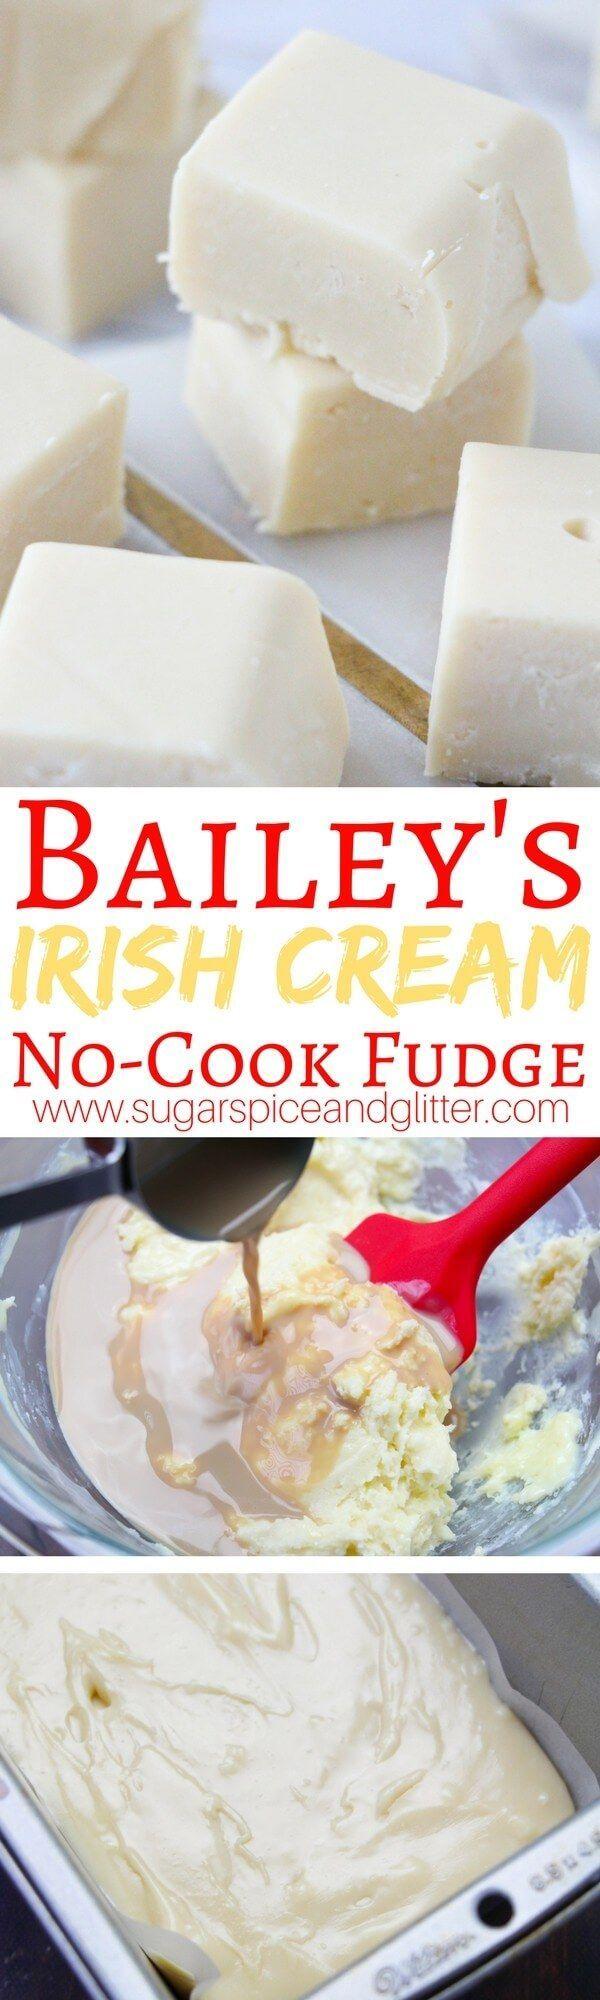 601 best Oh Fudge! images on Pinterest   Fudge recipes, Baking ...